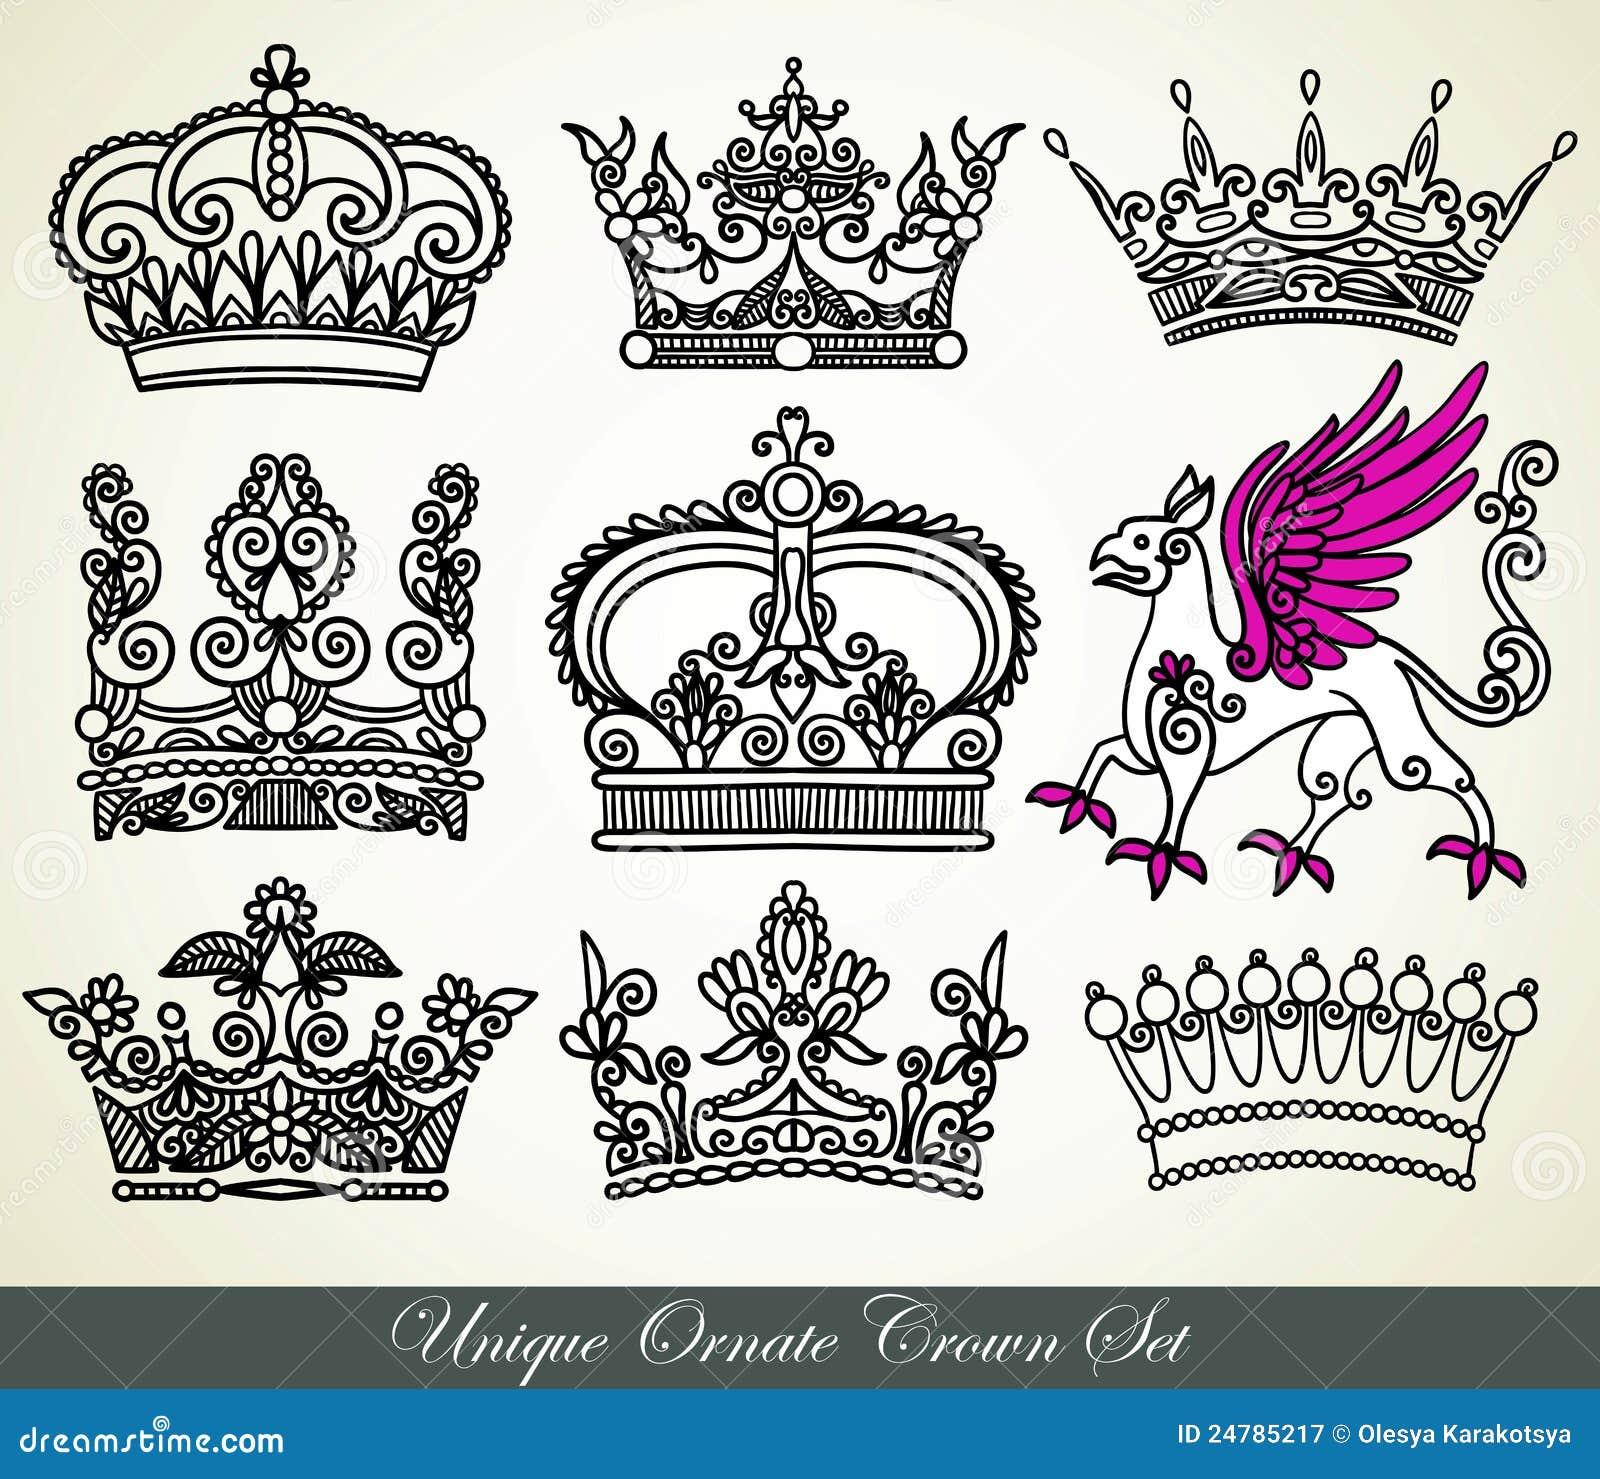 Heraldic Crown Royalty Free Stock Photography Image